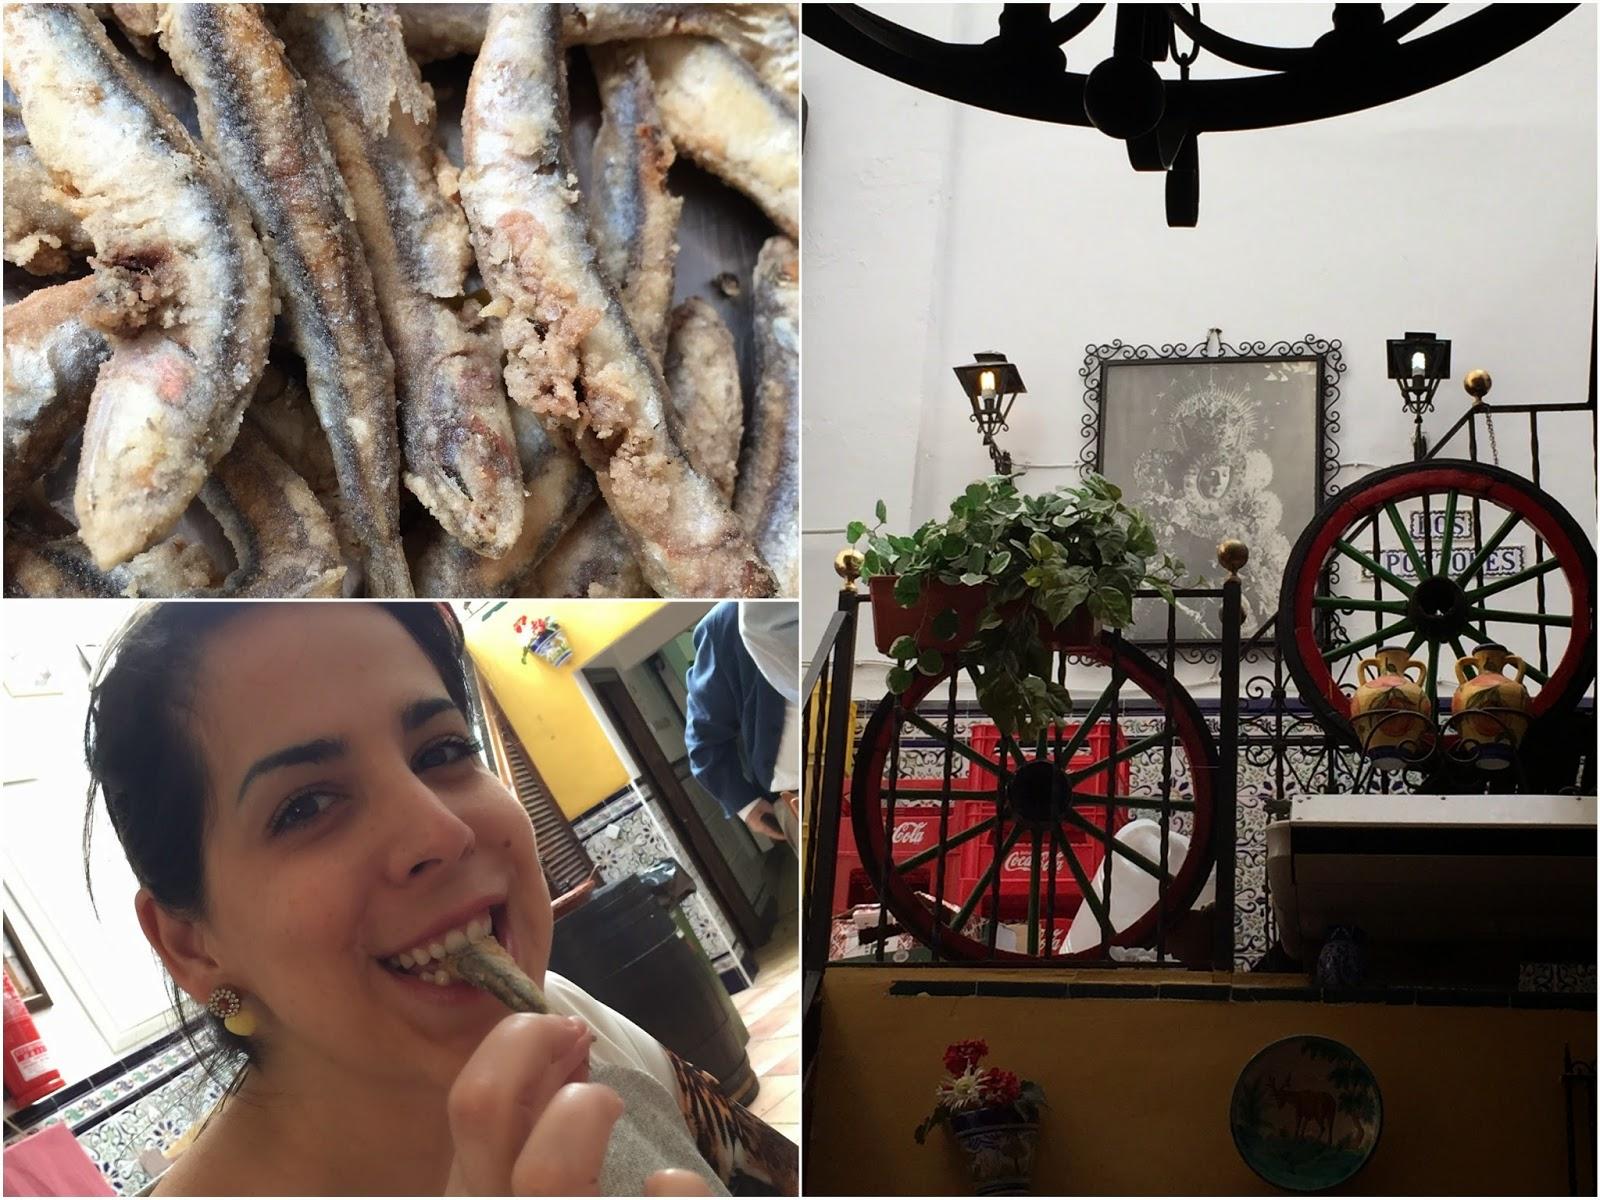 Sevilla, Seville, boquerones